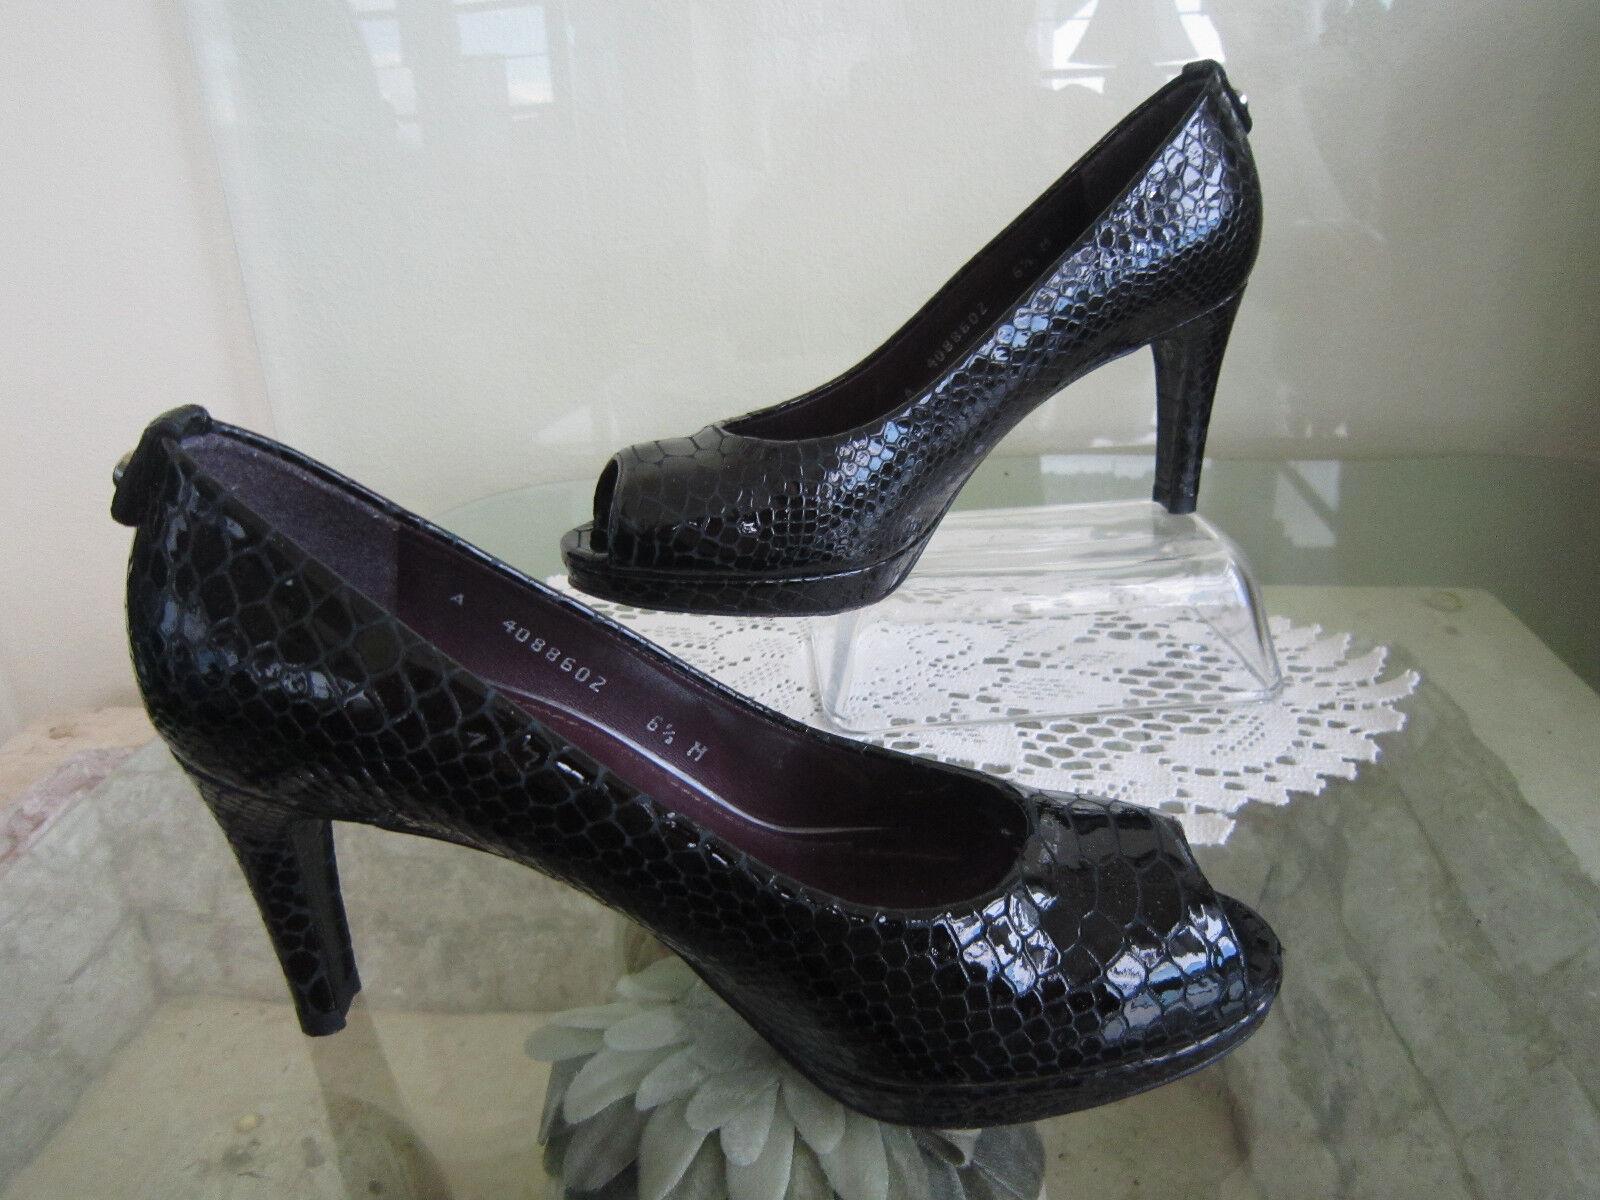 Stuart Weitzman Black Patent Leather Peep Toe Croc Classic Pump Sz 6 1 2 M